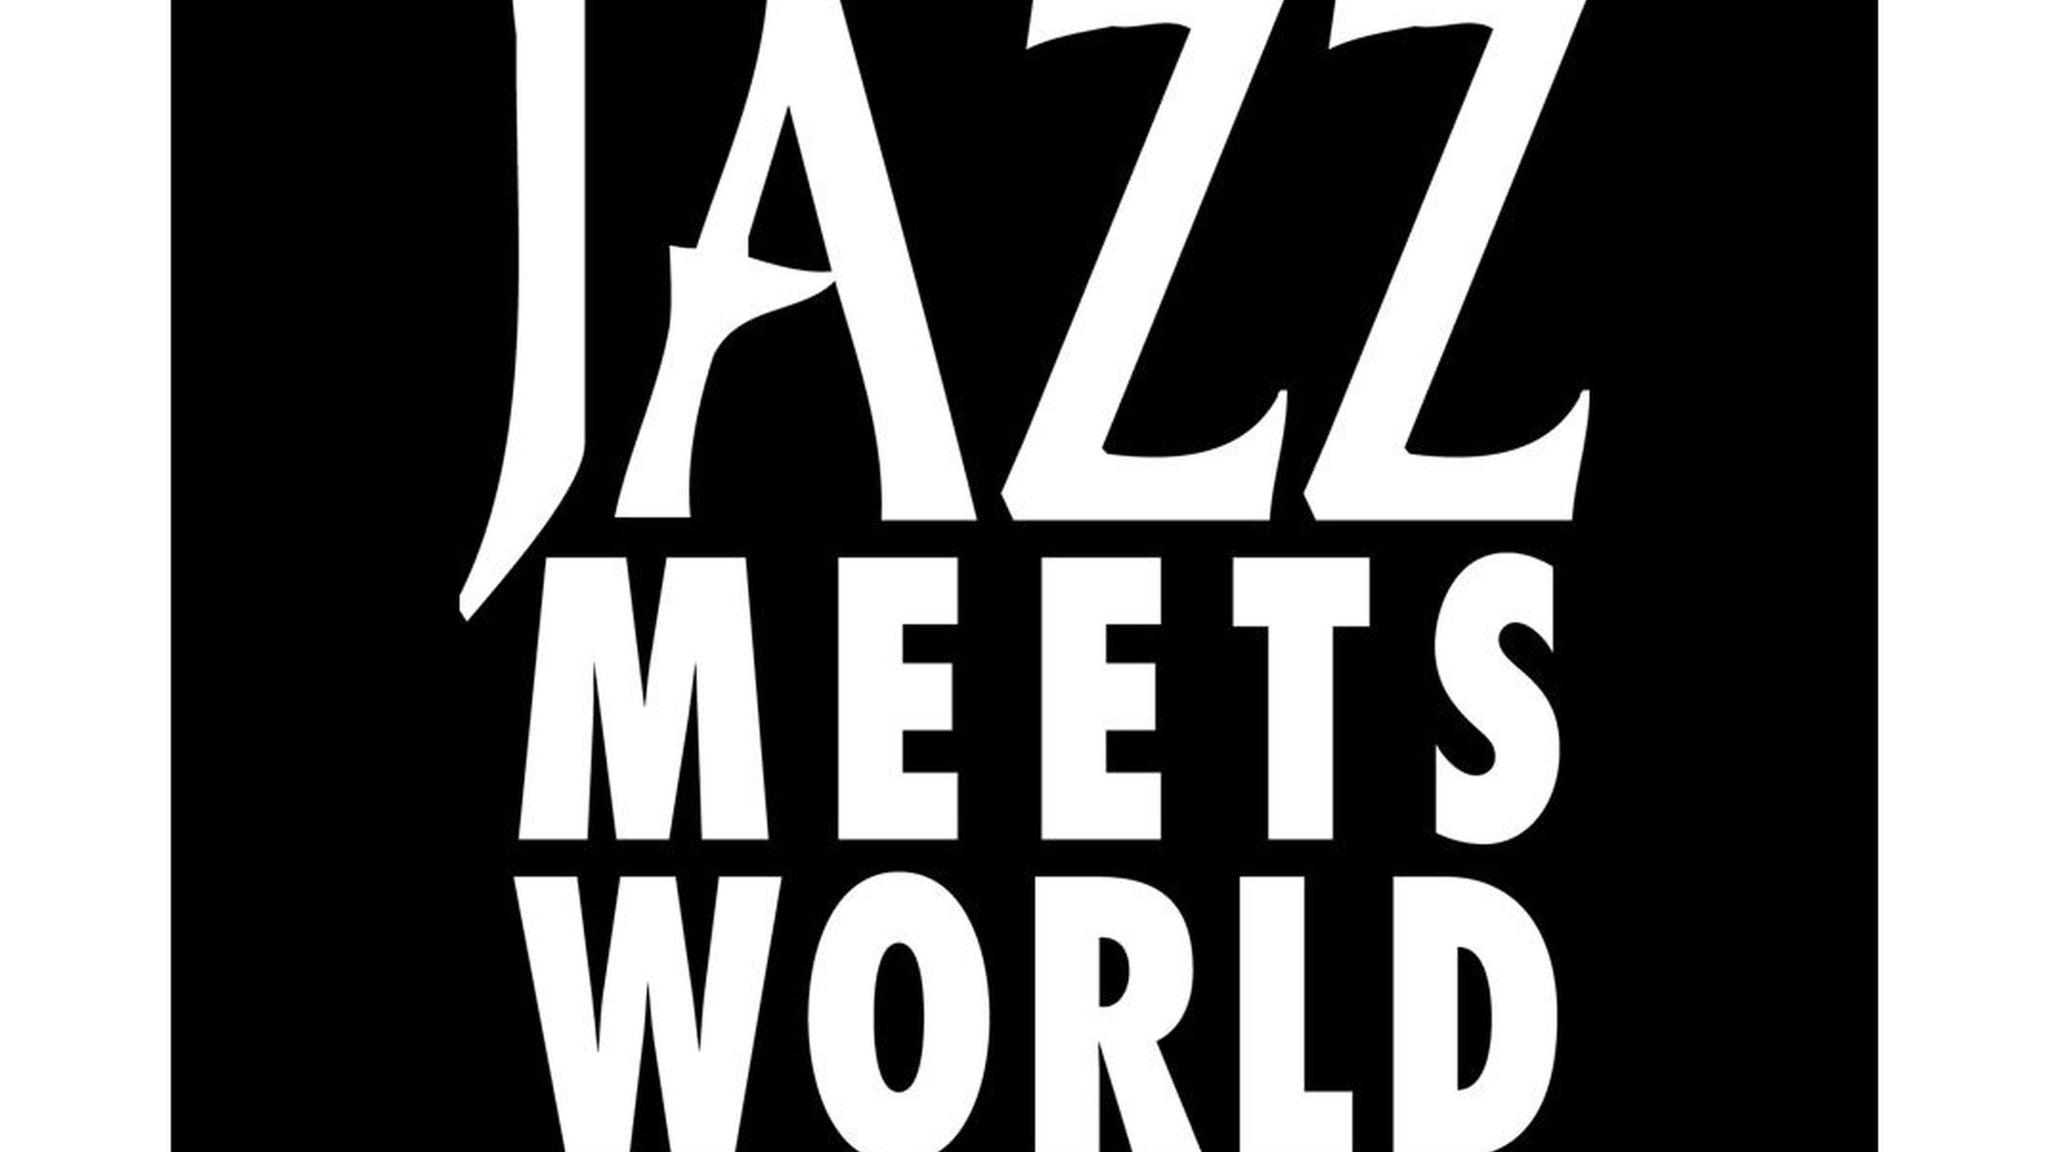 Jazz Meets World